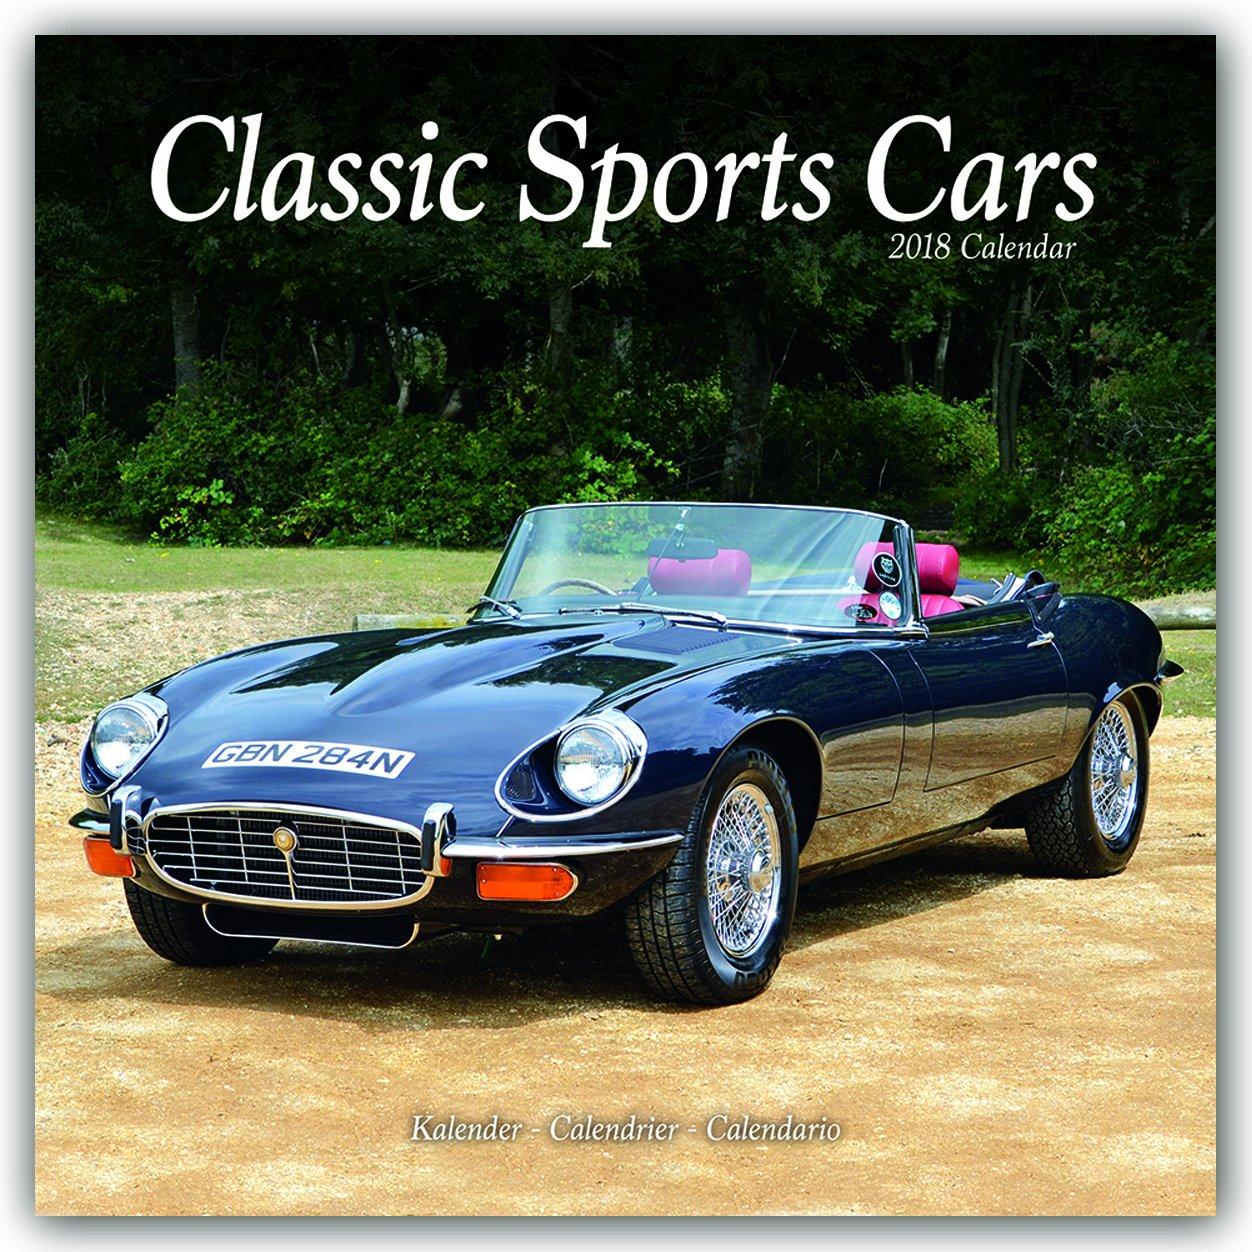 Sports Cars Calendar Classic Sports Cars Calendar Calendars - Sports cars calendar 2018